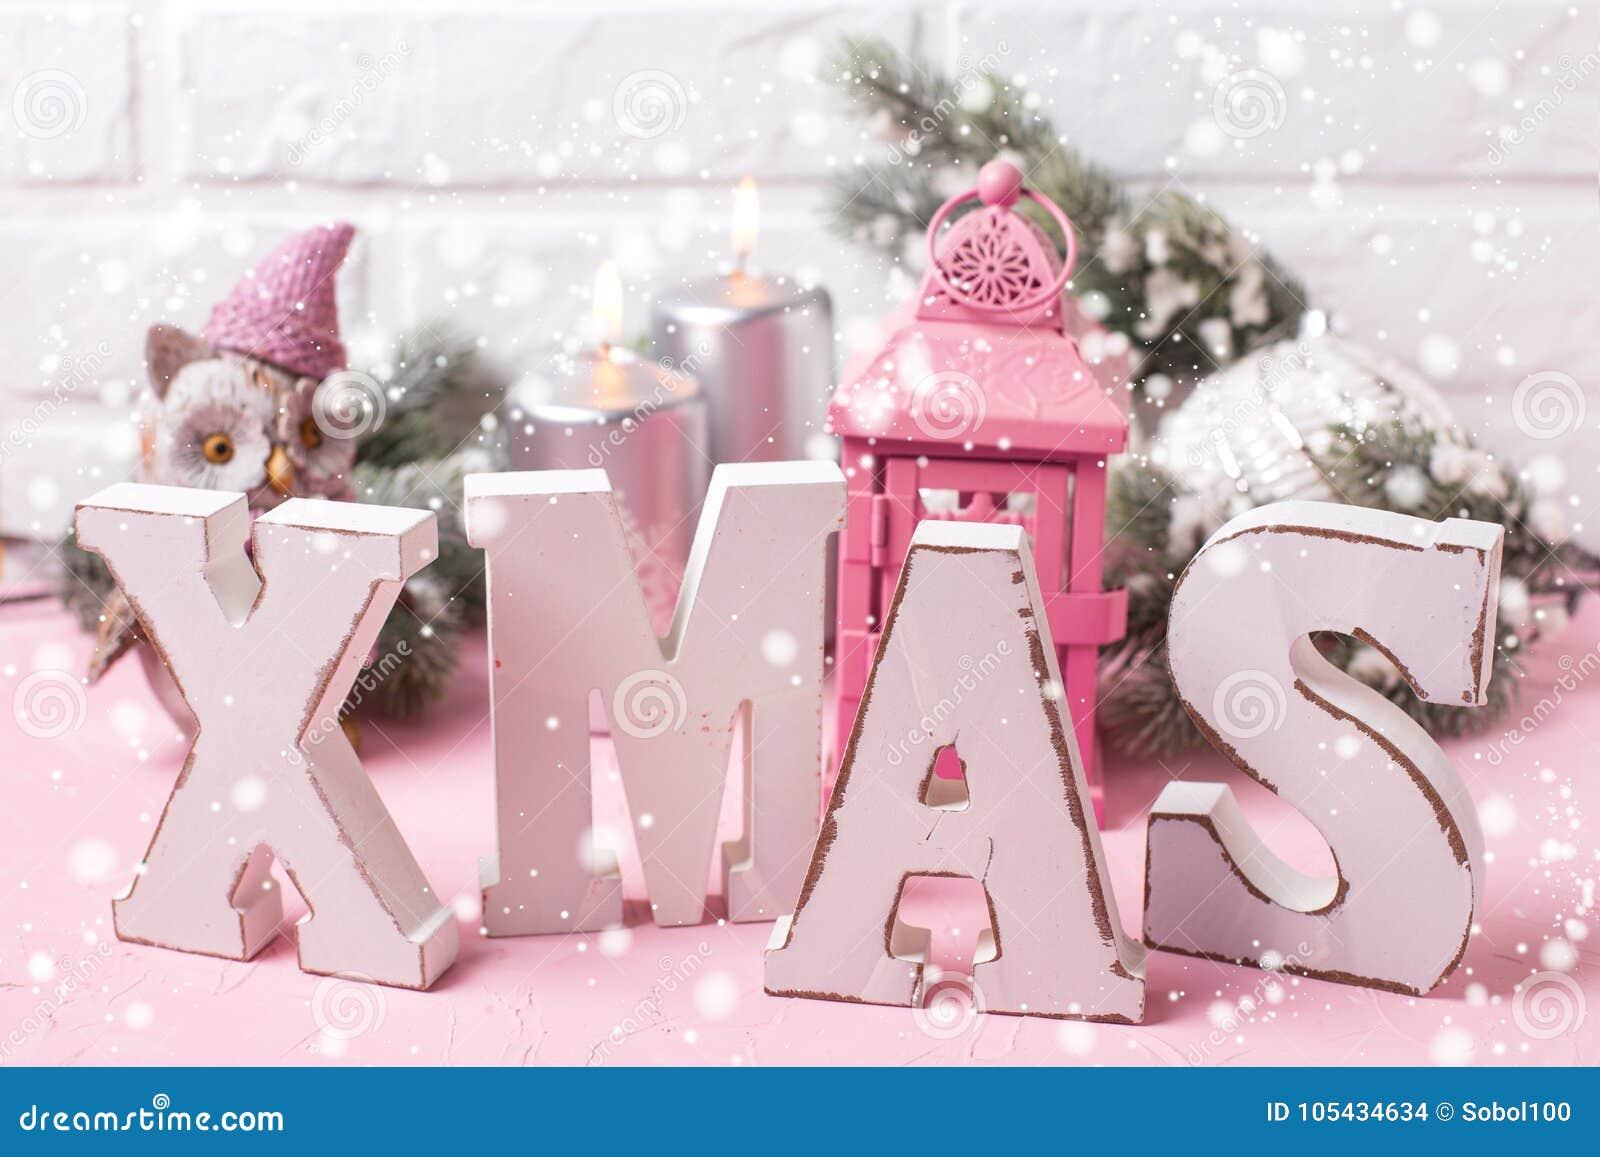 Vintage Pink Christmas. Stock Photo. Image Of Noel, Word